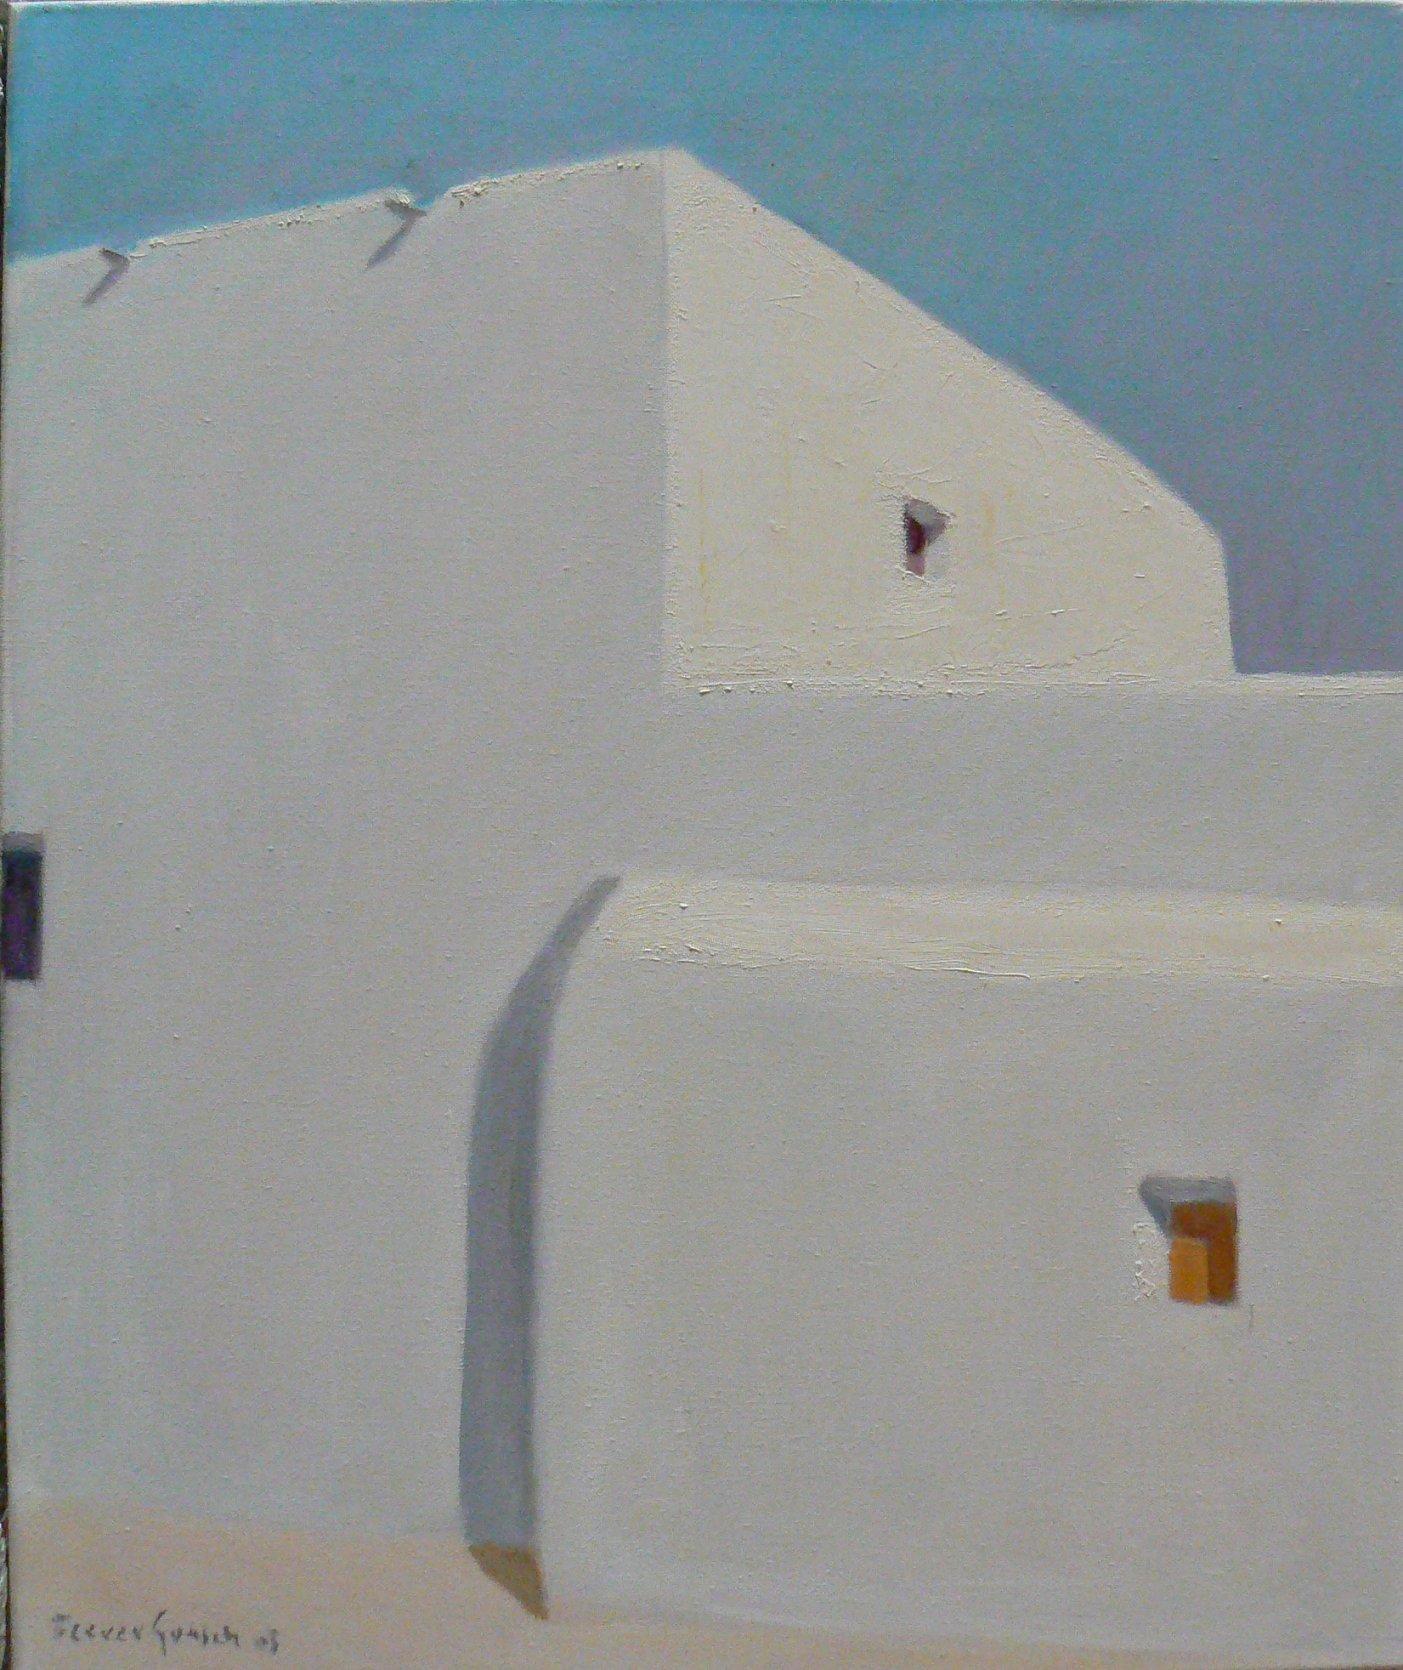 Rincón de Sa Penya, Ibiza (2003) - Vicent Ferrer Guasch